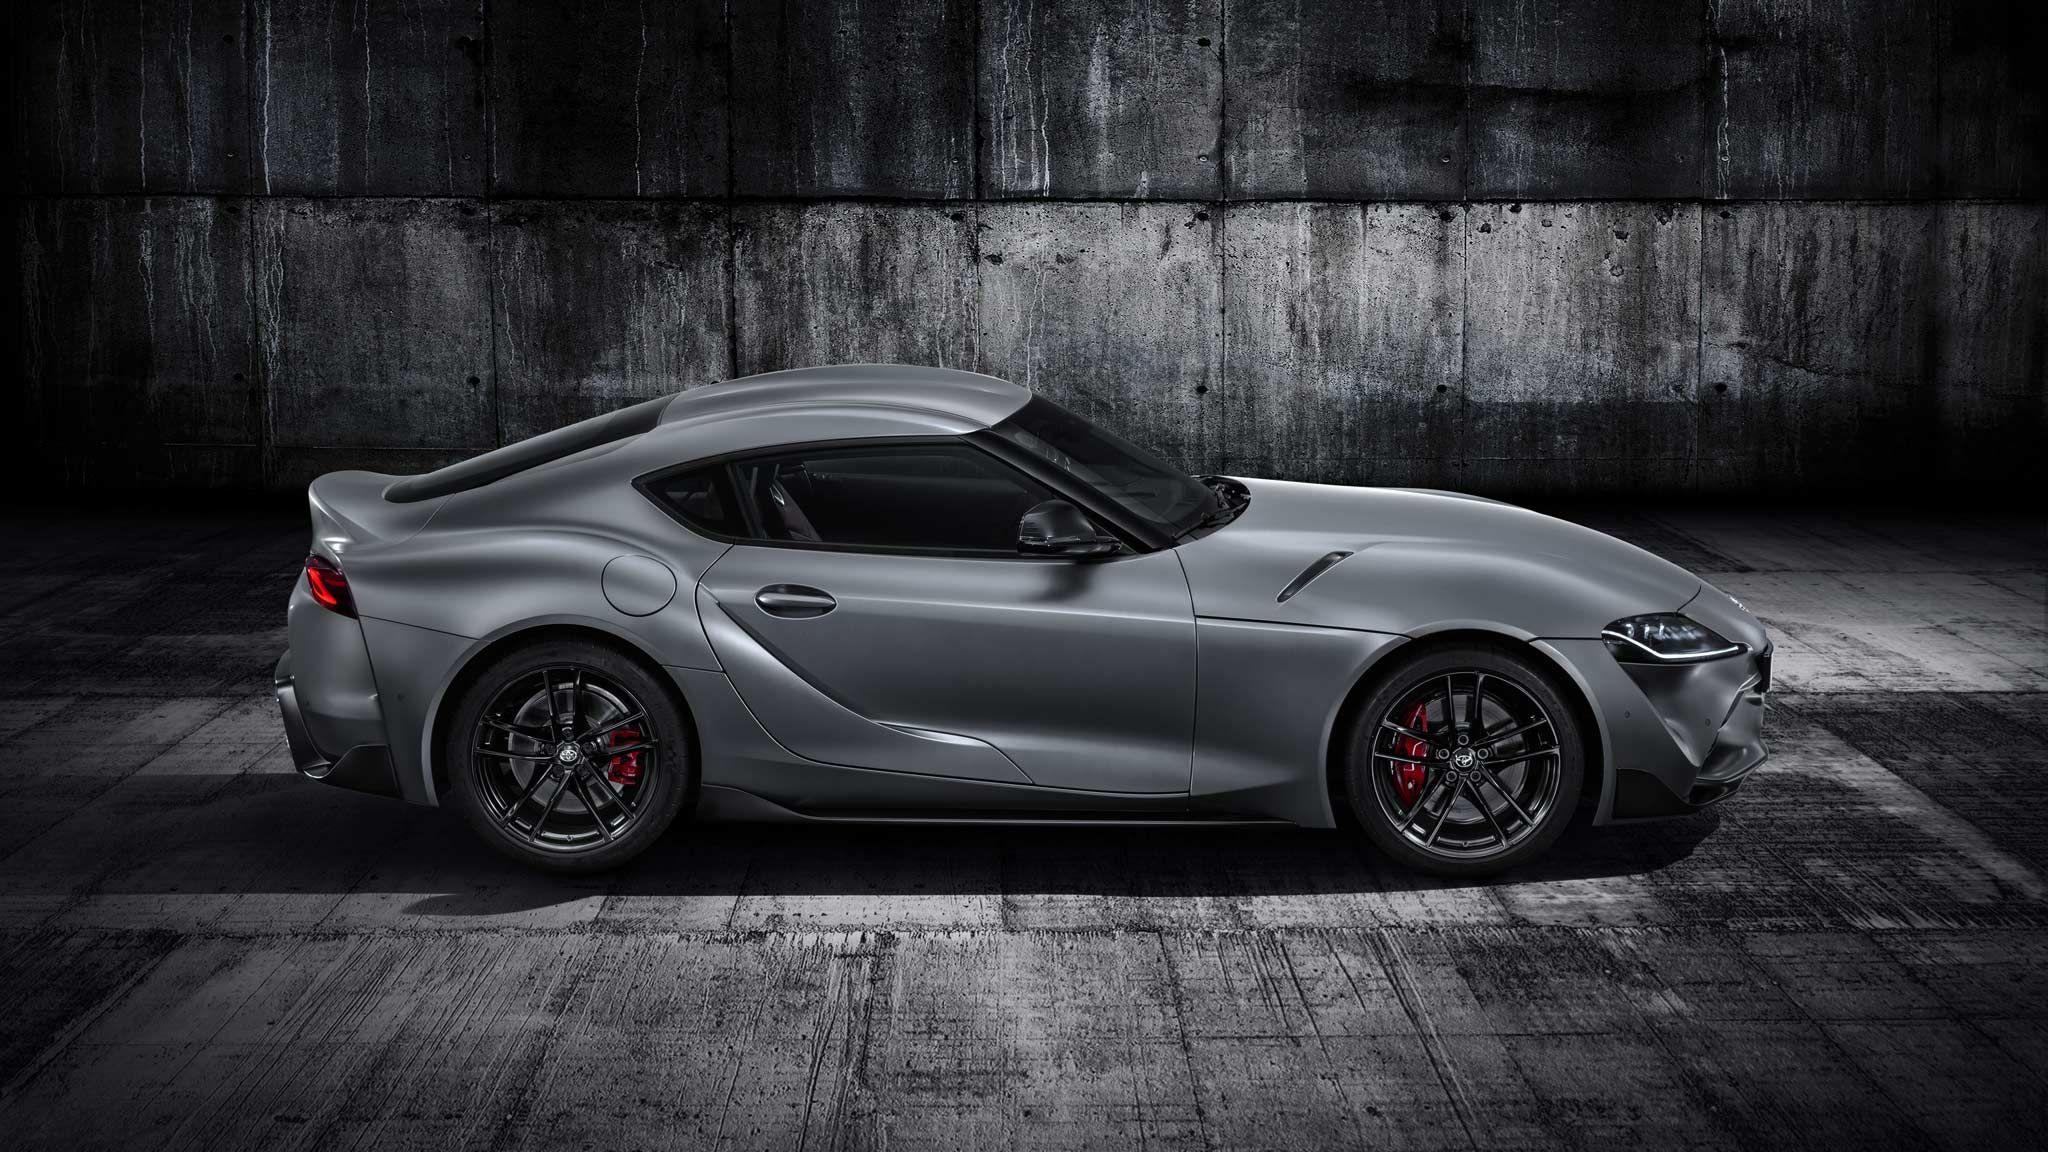 d1e6c7b12974be New Toyota Supra 2019 | Samochody / Cars | Pinterest | Toyota supra ...